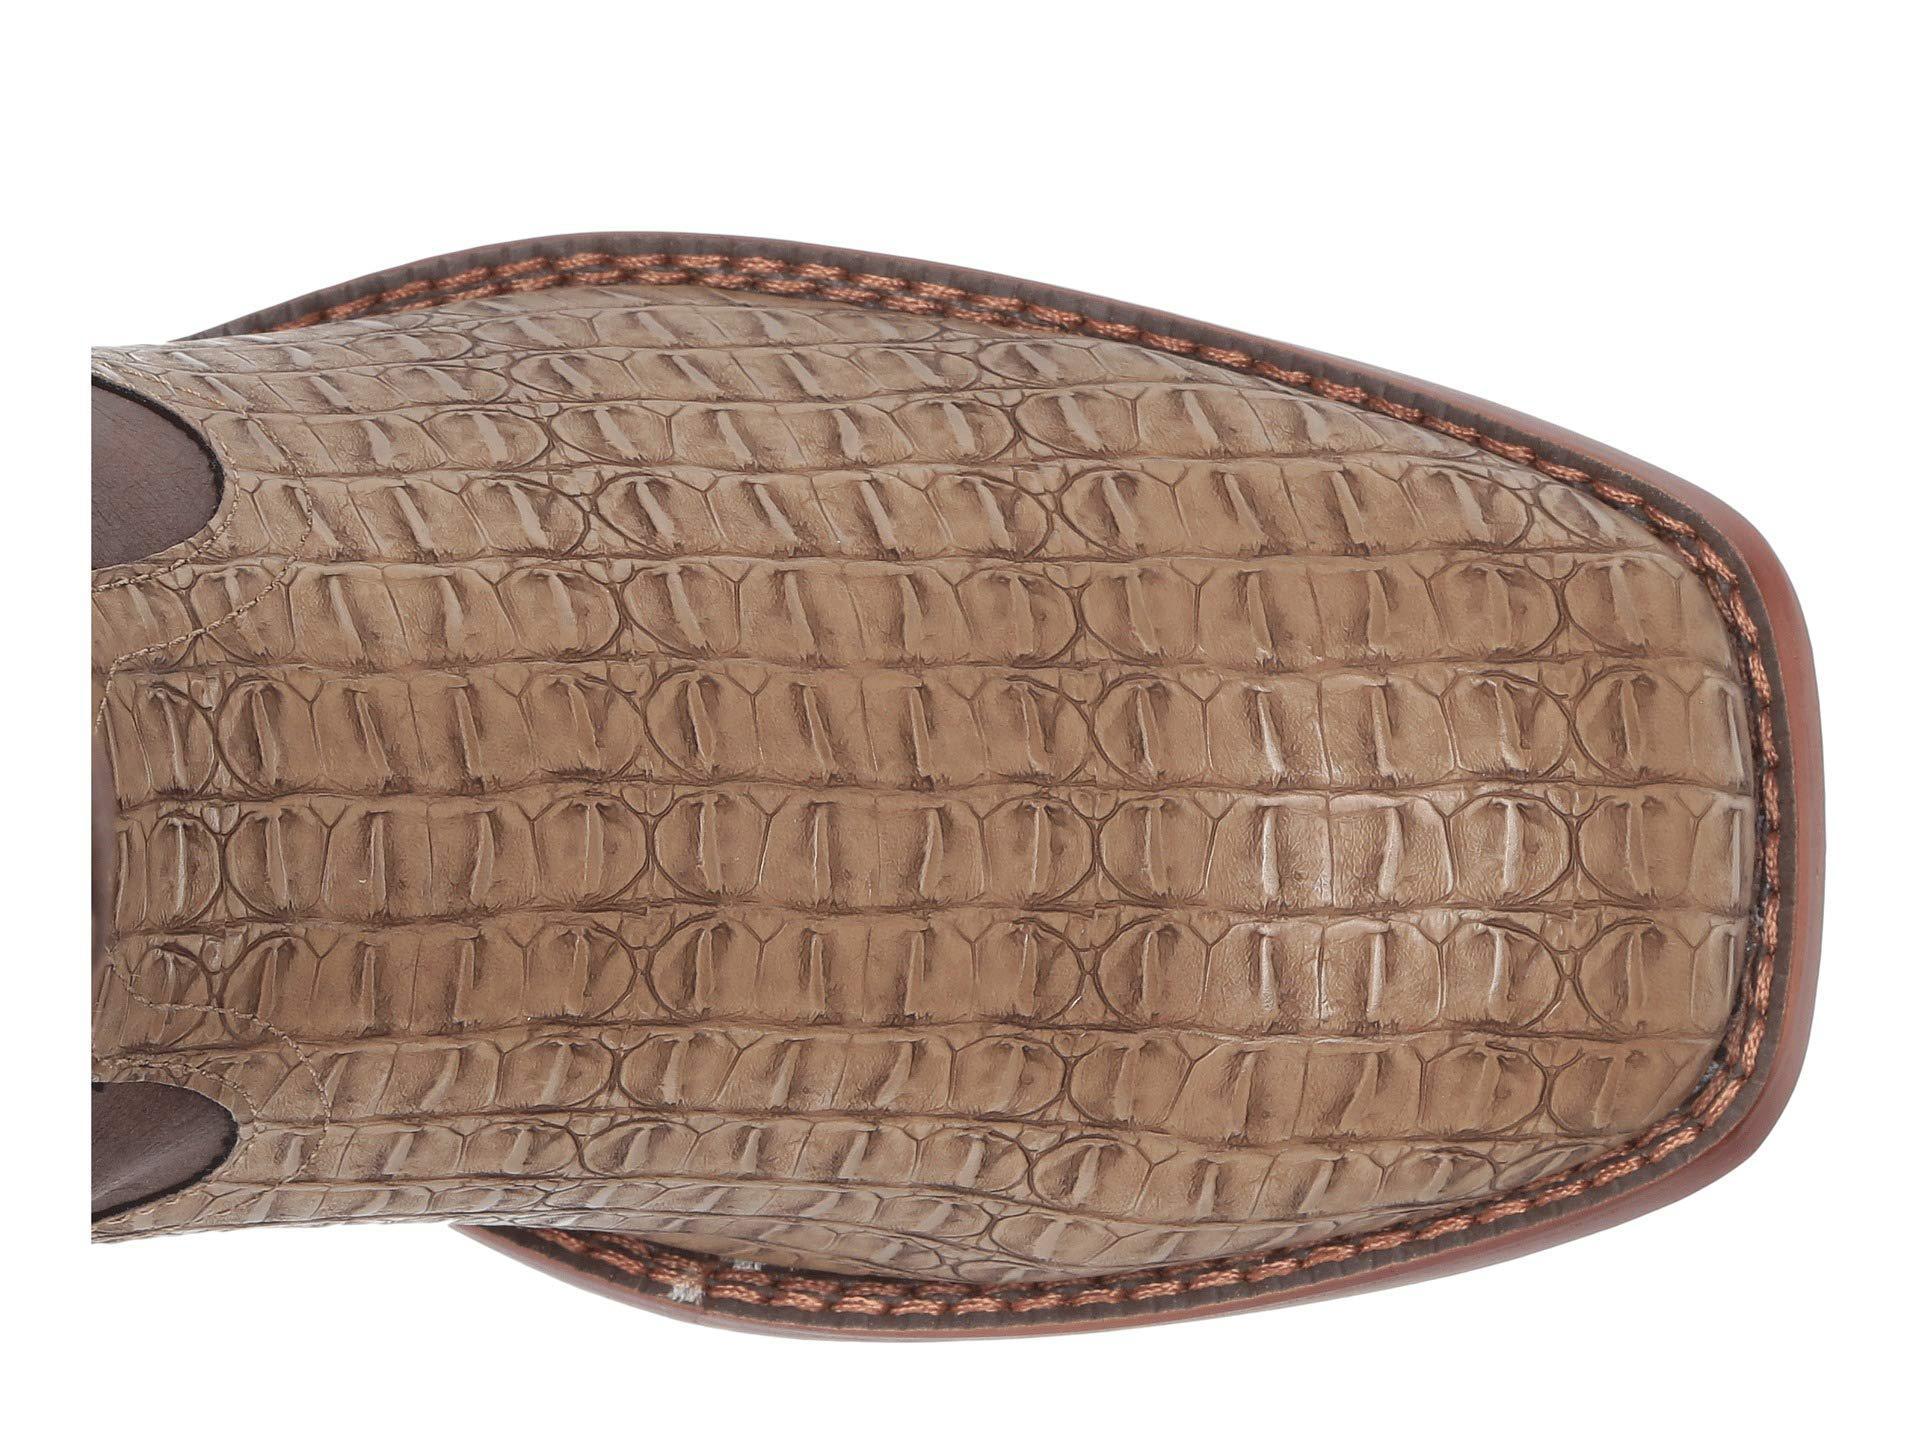 d2822ecff76 Lyst - Roper Chomp (black Faux Caiman Vamp/vintage Shaft) Cowboy ...